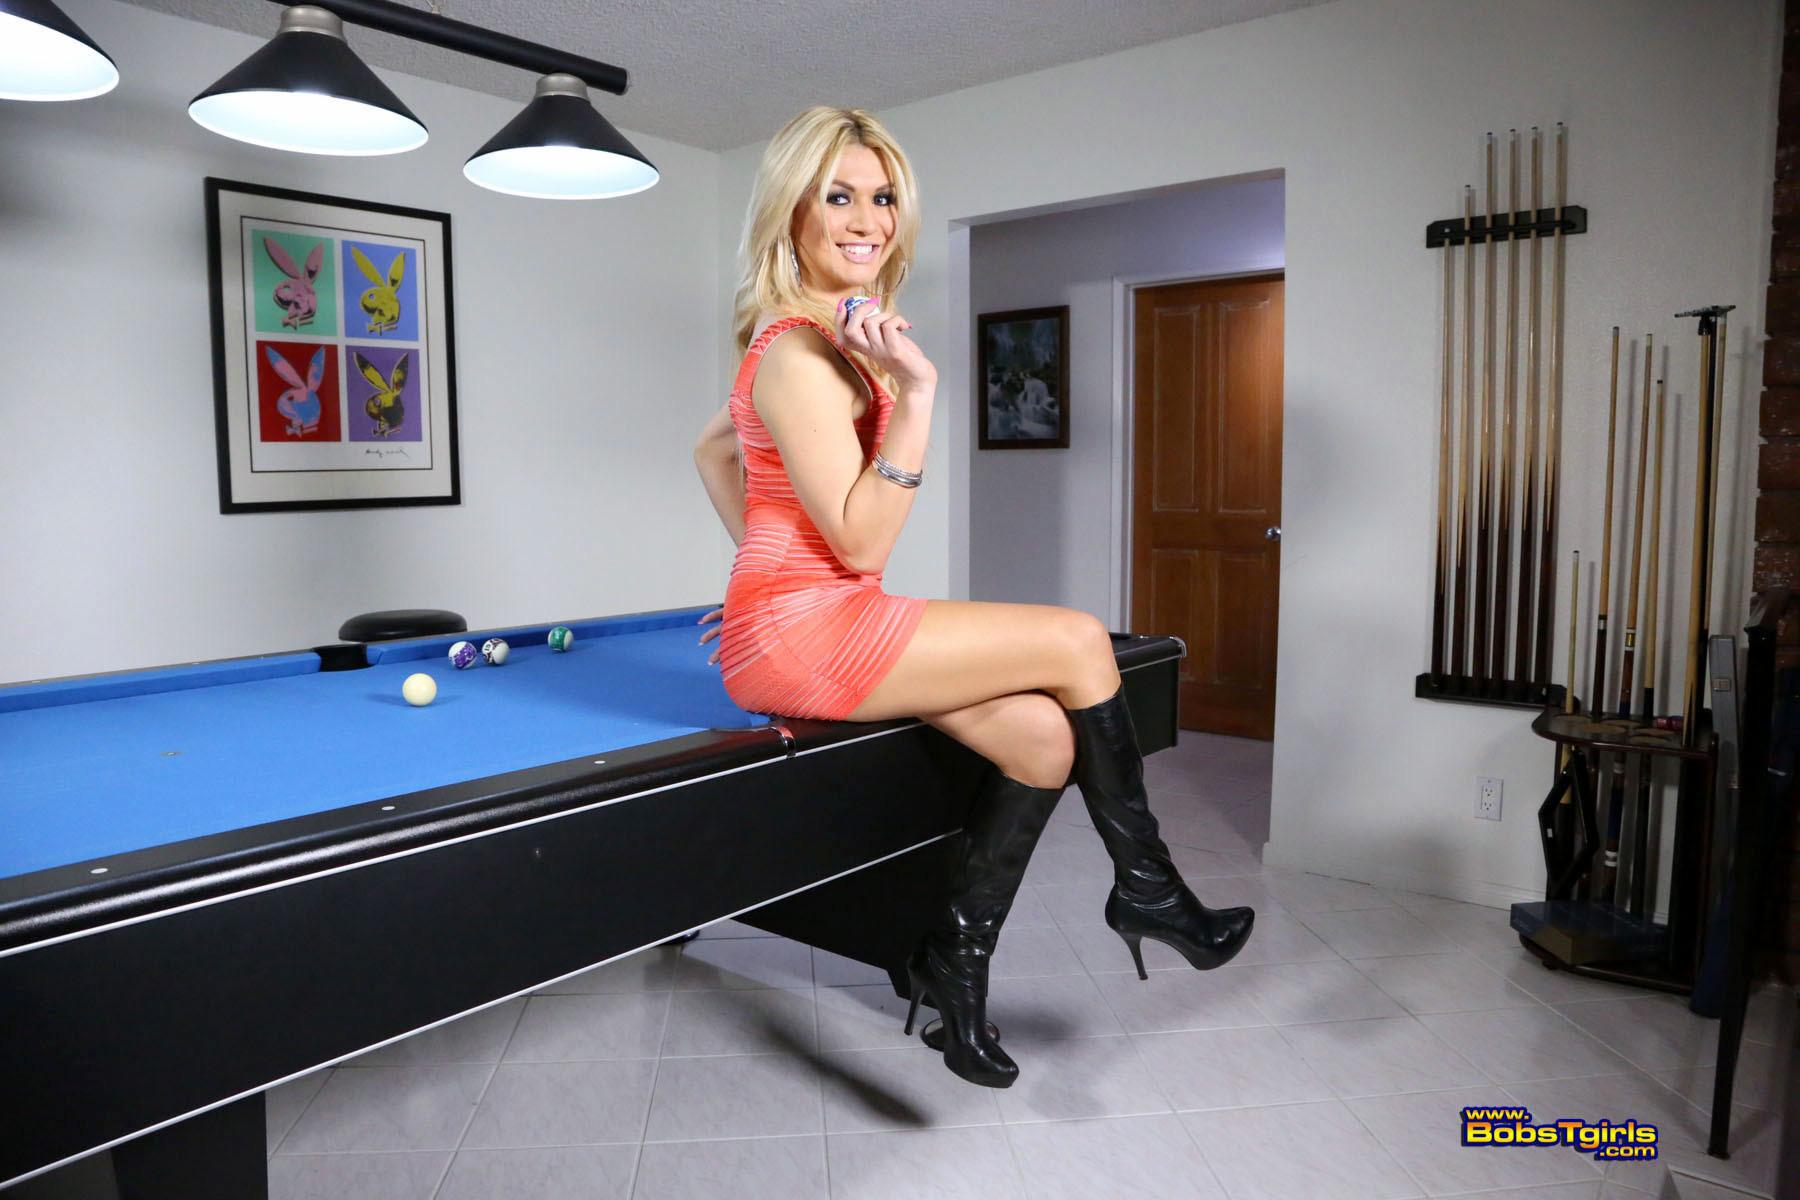 Sweet Gianna Posing On Pool Table